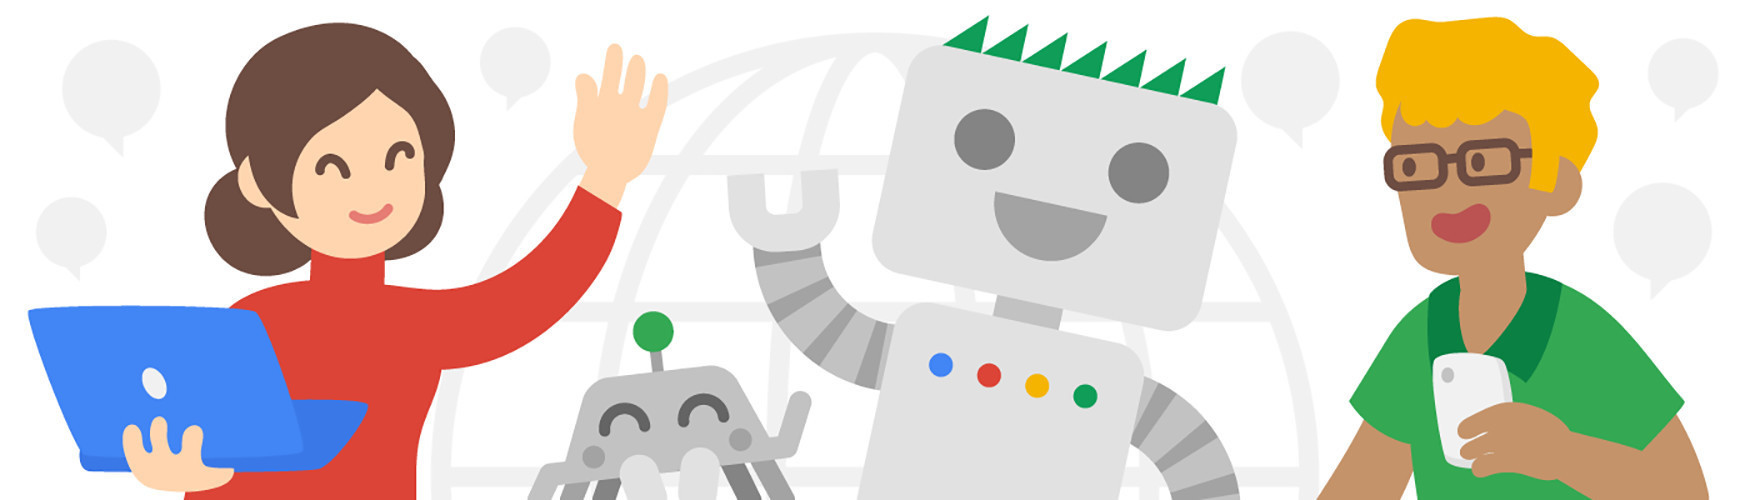 Google 2020 Webspam report 網路垃圾偵測報告-強化網站資訊安全|鯊客科技SEO優化網頁設計公司